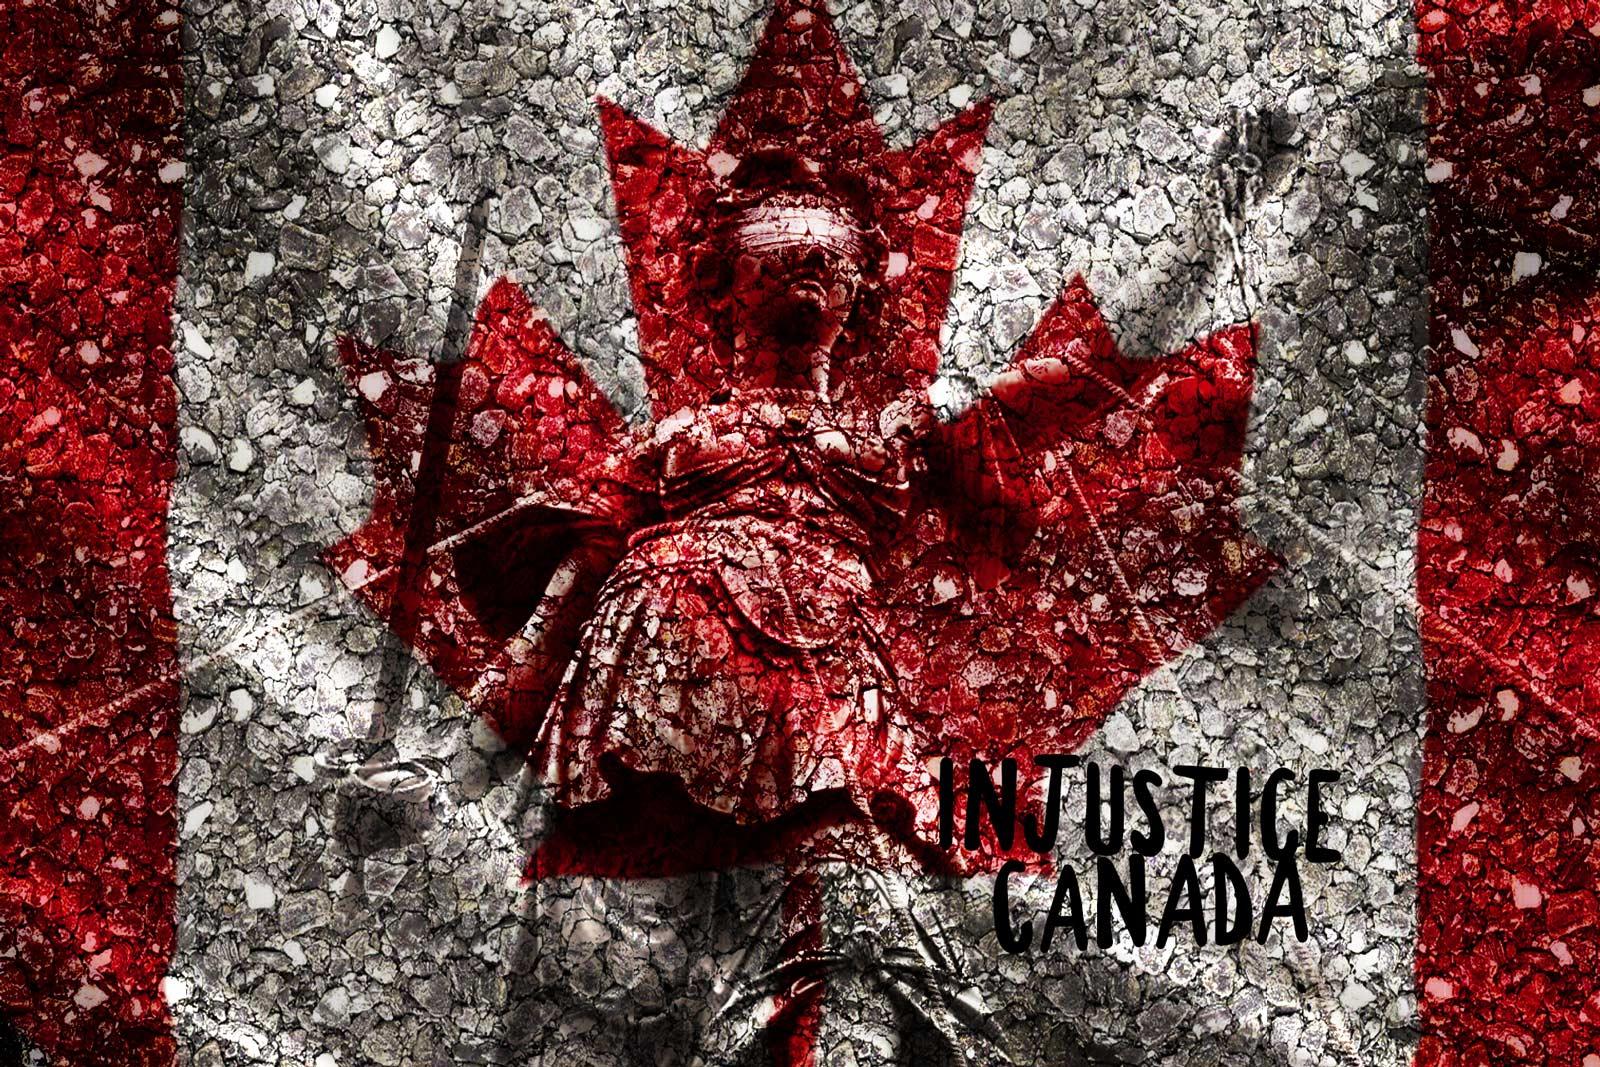 Injustice Canada